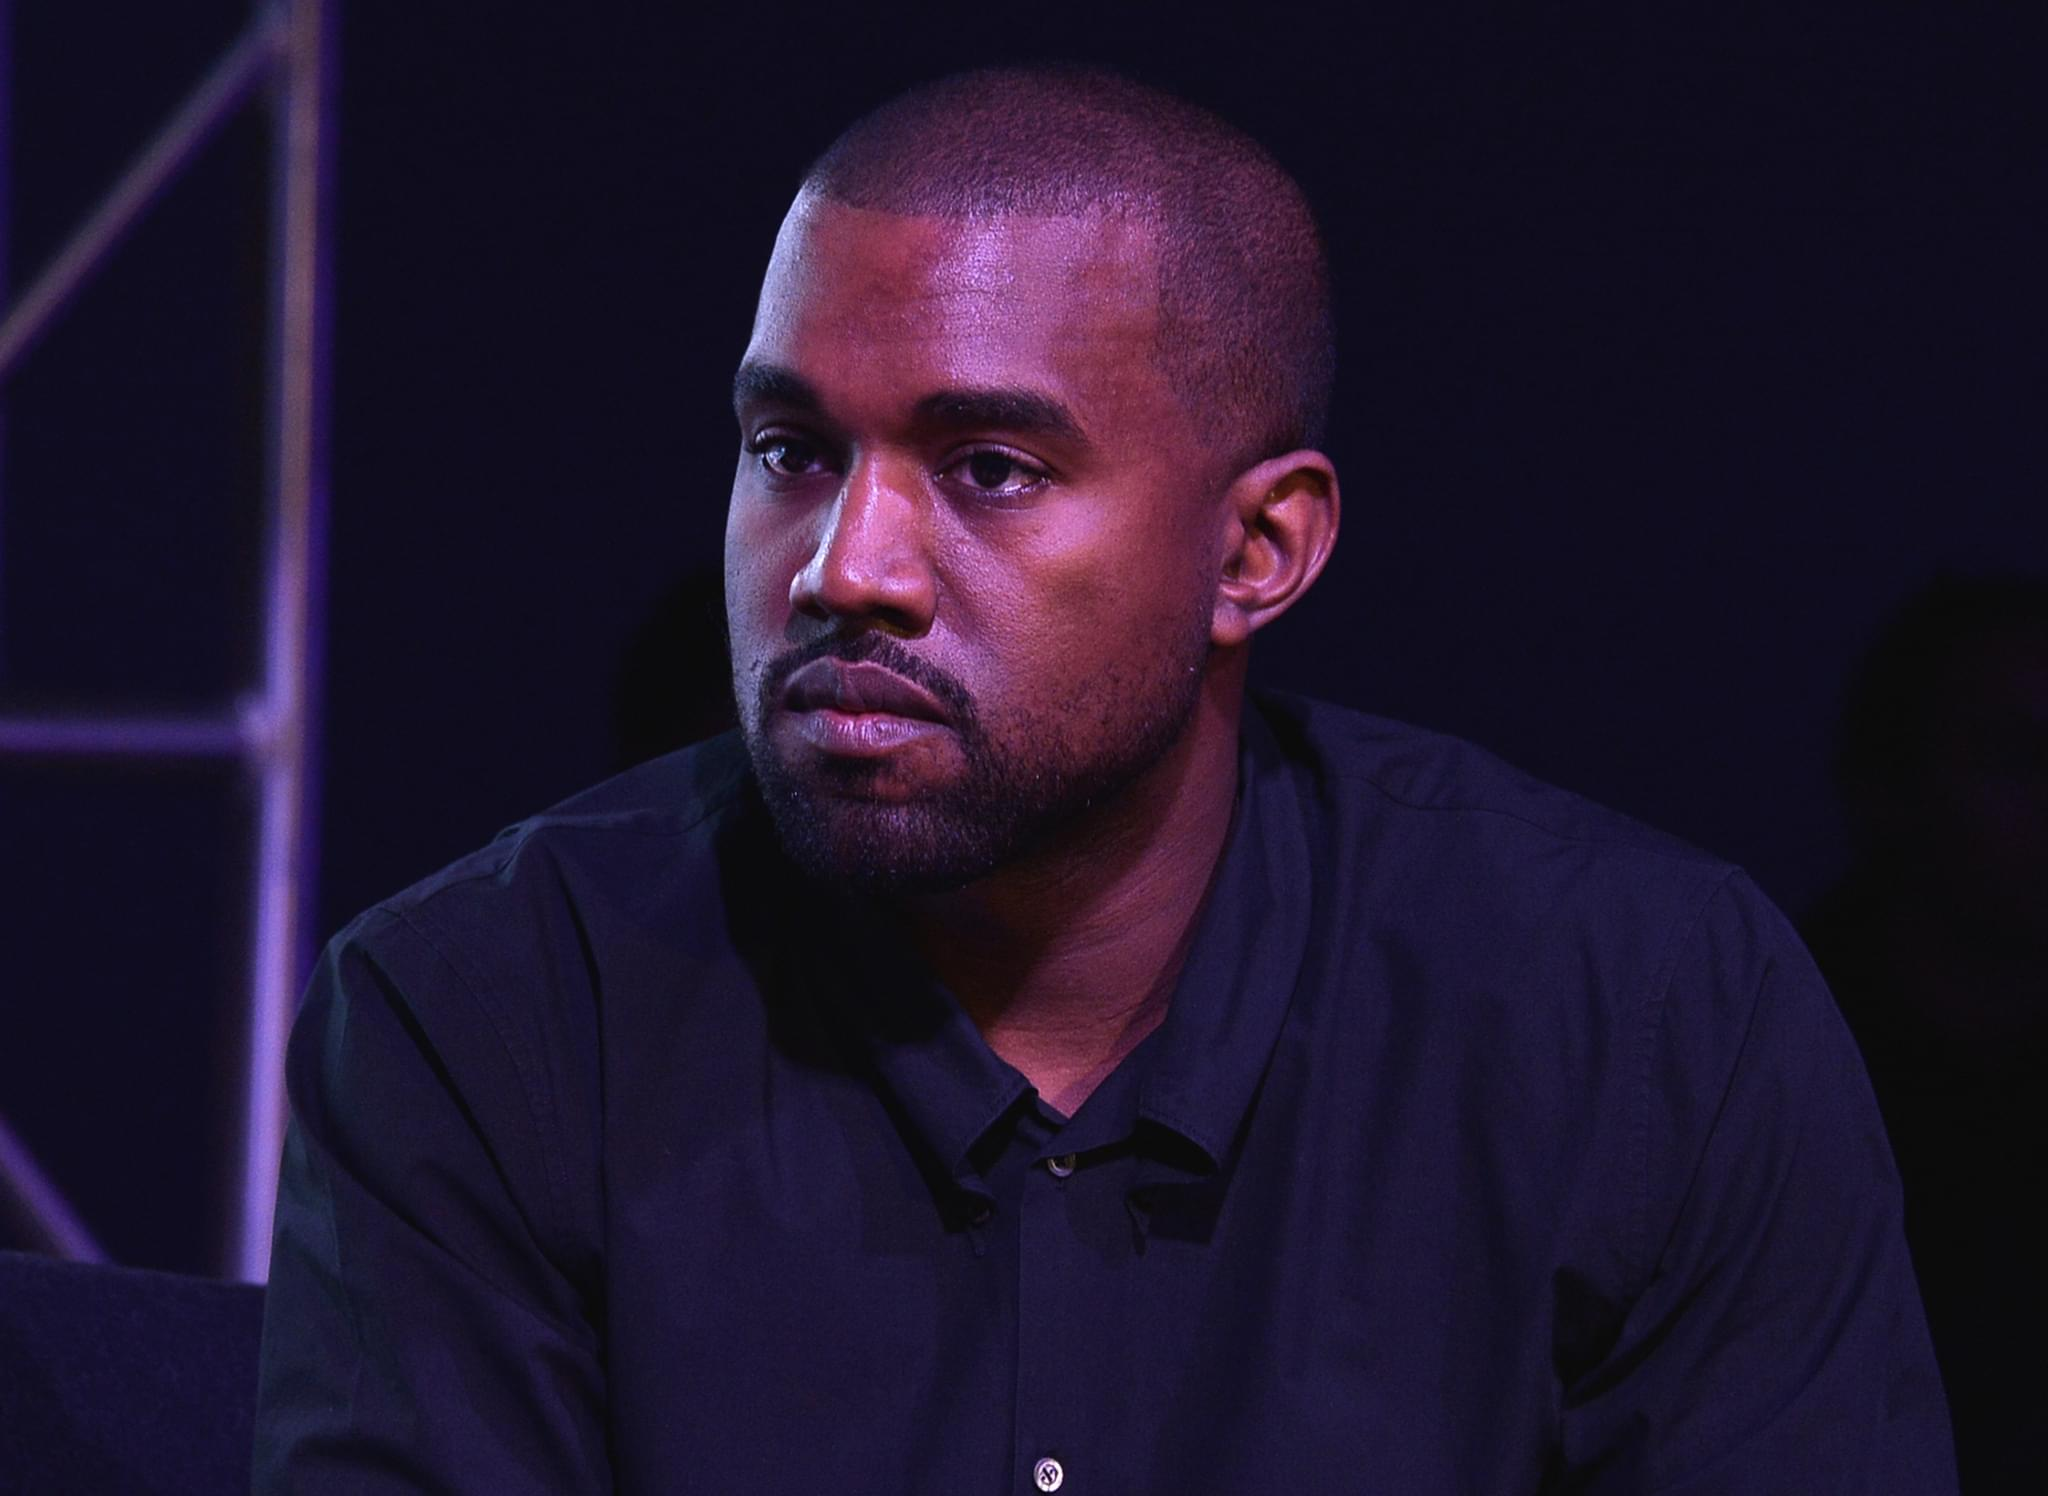 Kanye West Is Still Running For President in 2020